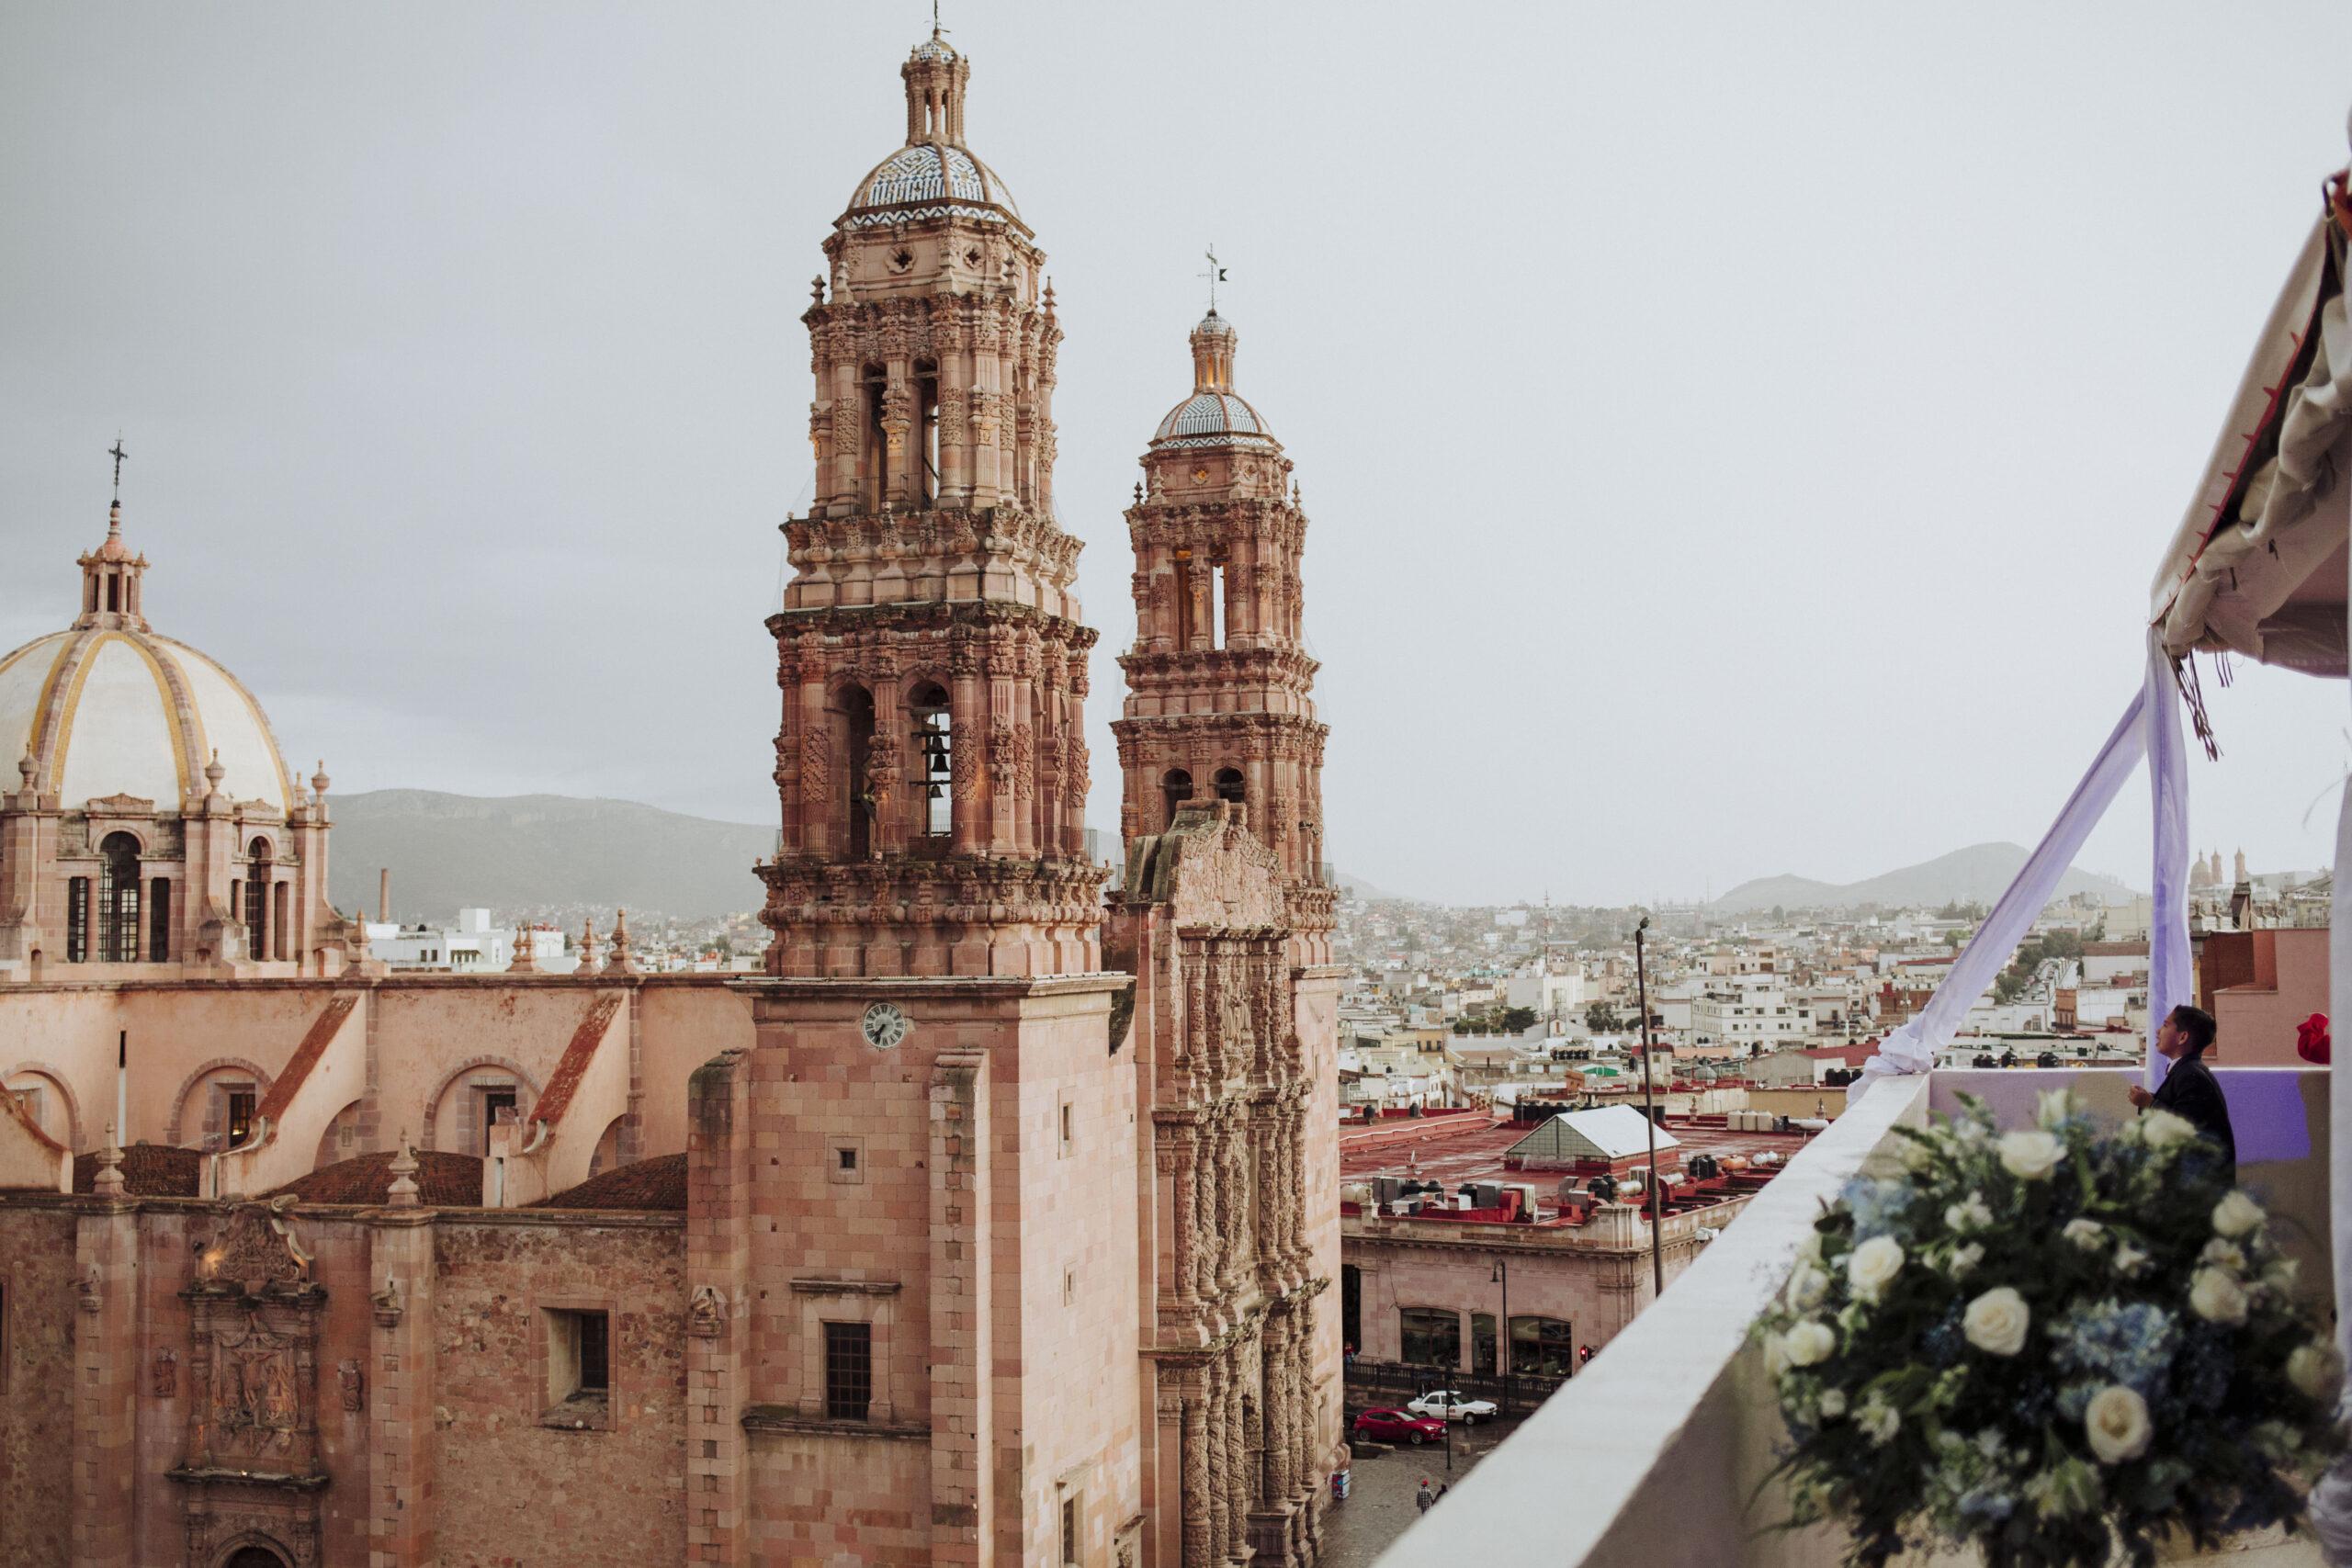 javier_noriega_fotografo_profesional_bodas_zacatecas_mexico_chihuahua_photographer70